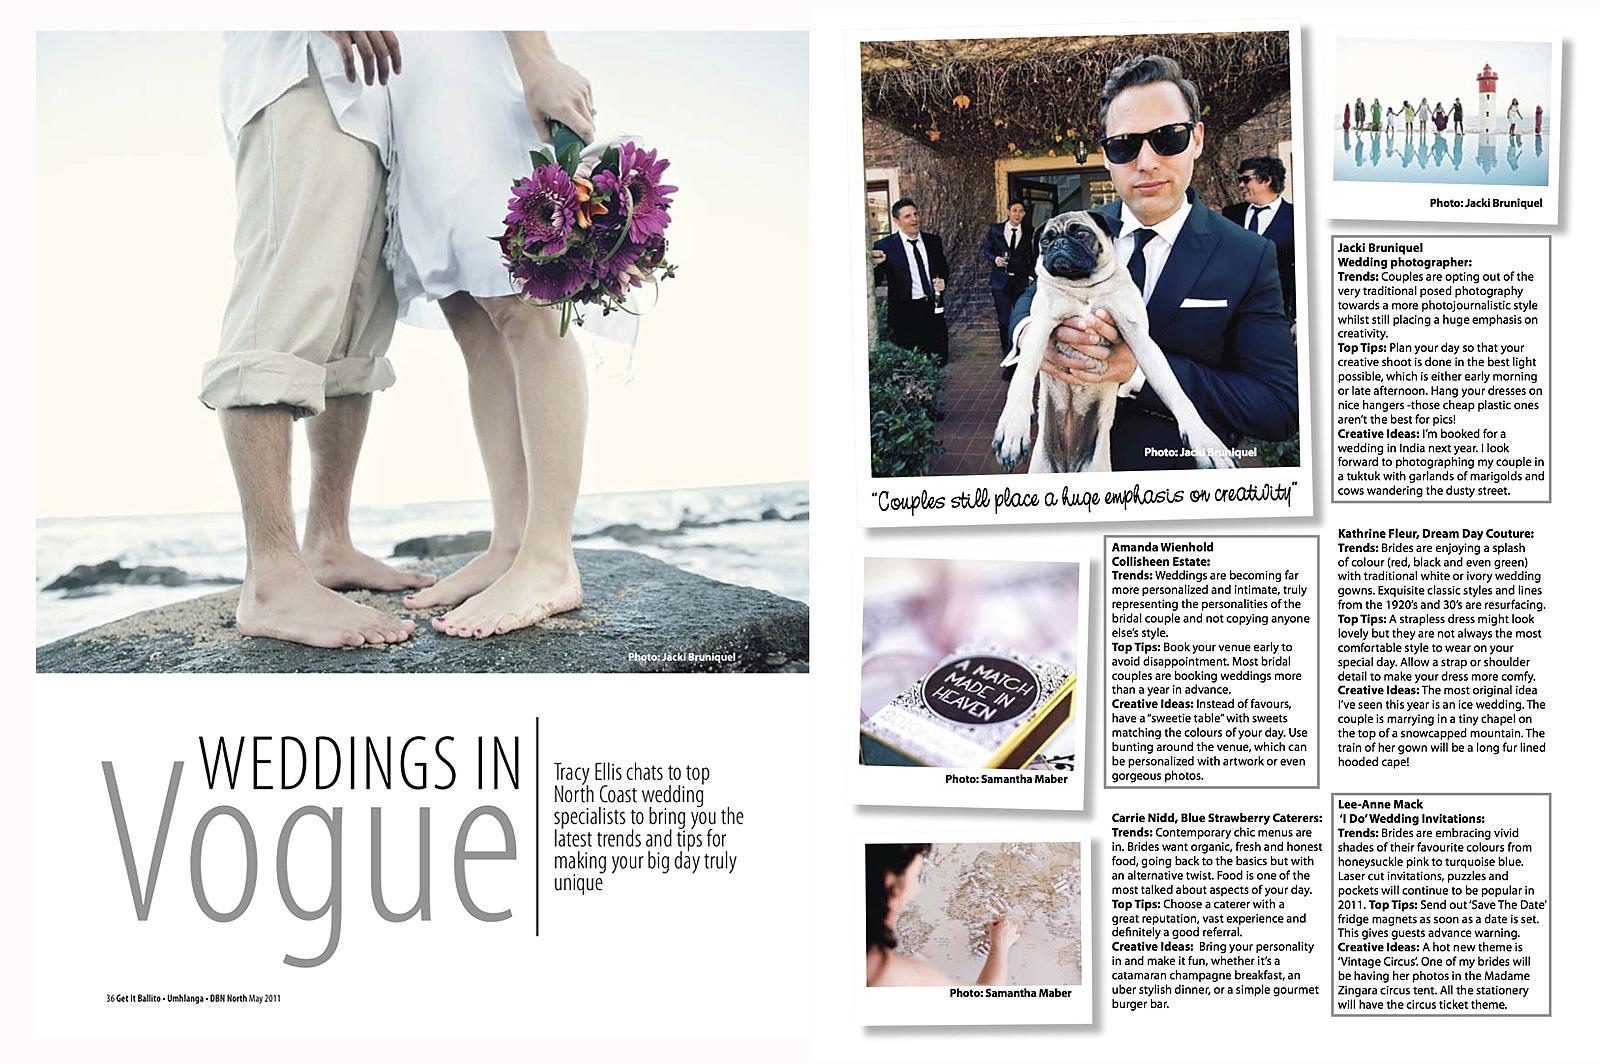 Get-It-Magazine-KZN-Photographer-Jacki-Bruniquel-1